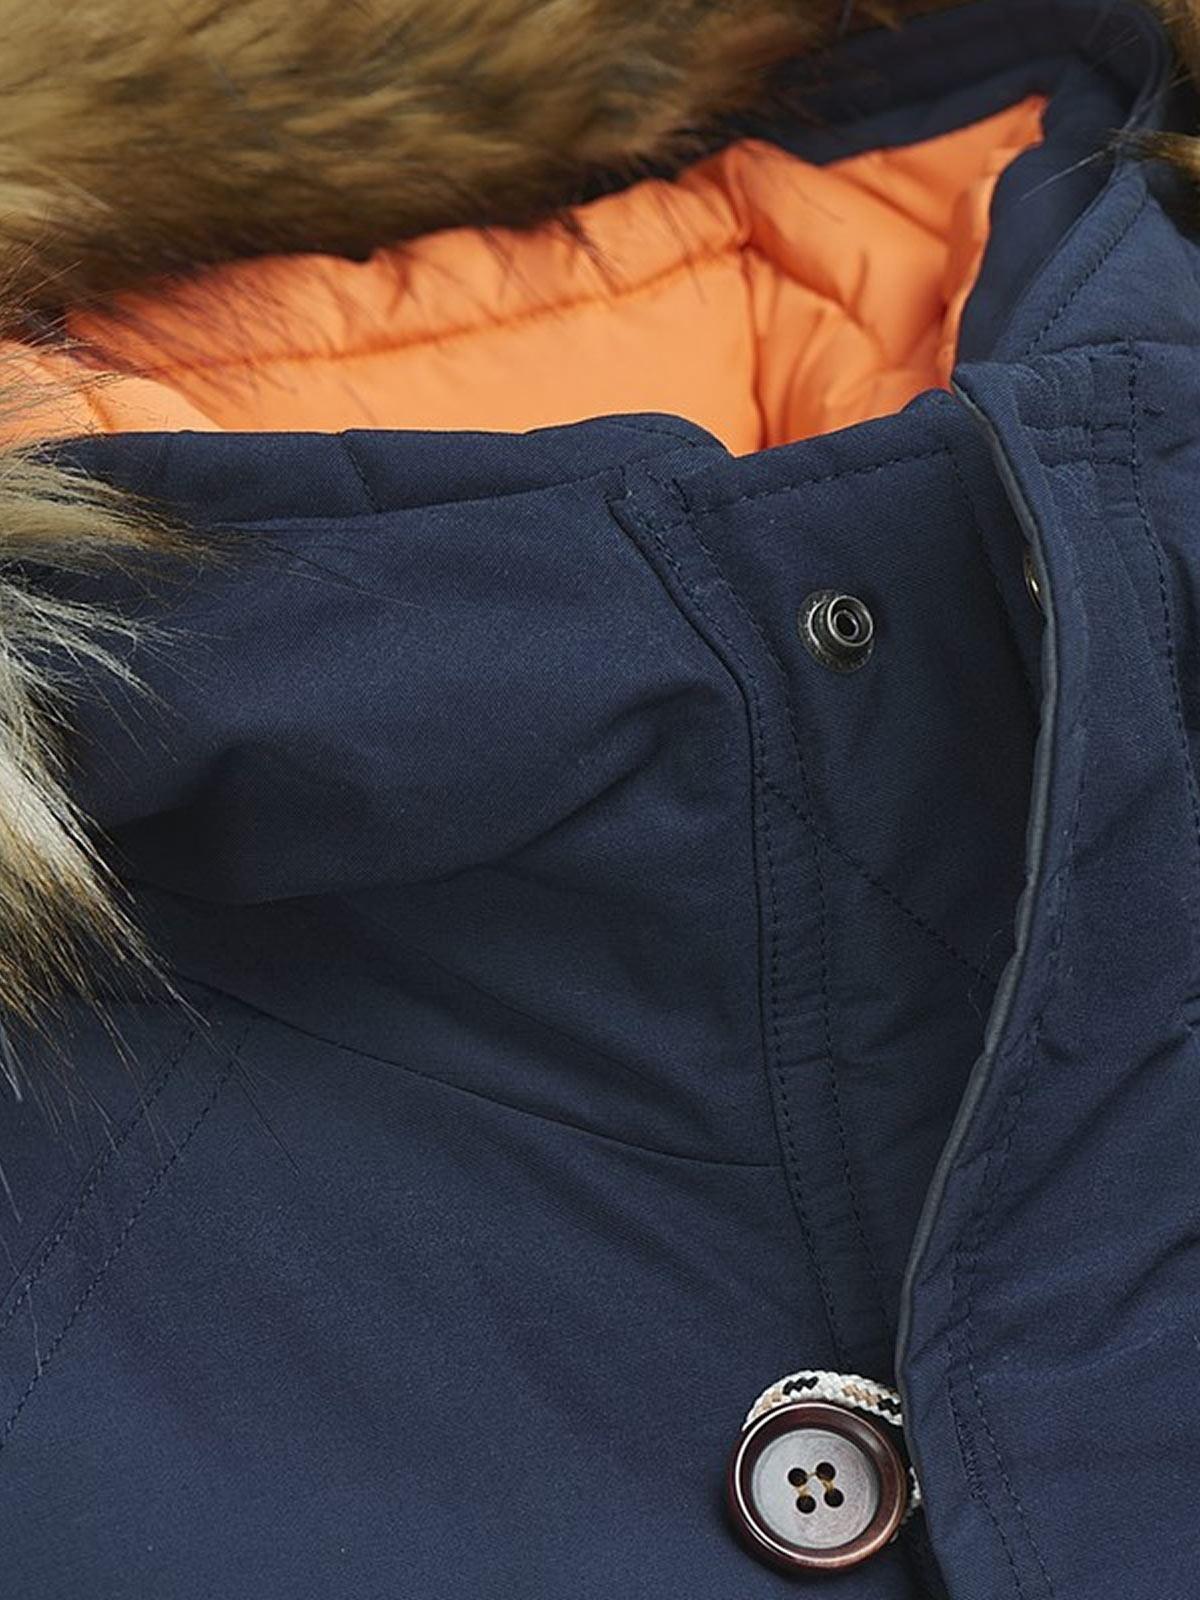 Mens-parka-Chaqueta-Jack-amp-Jones-De-Bosque-Con-Capucha-Abrigo-Cremallera-Sherpa-Linned miniatura 4